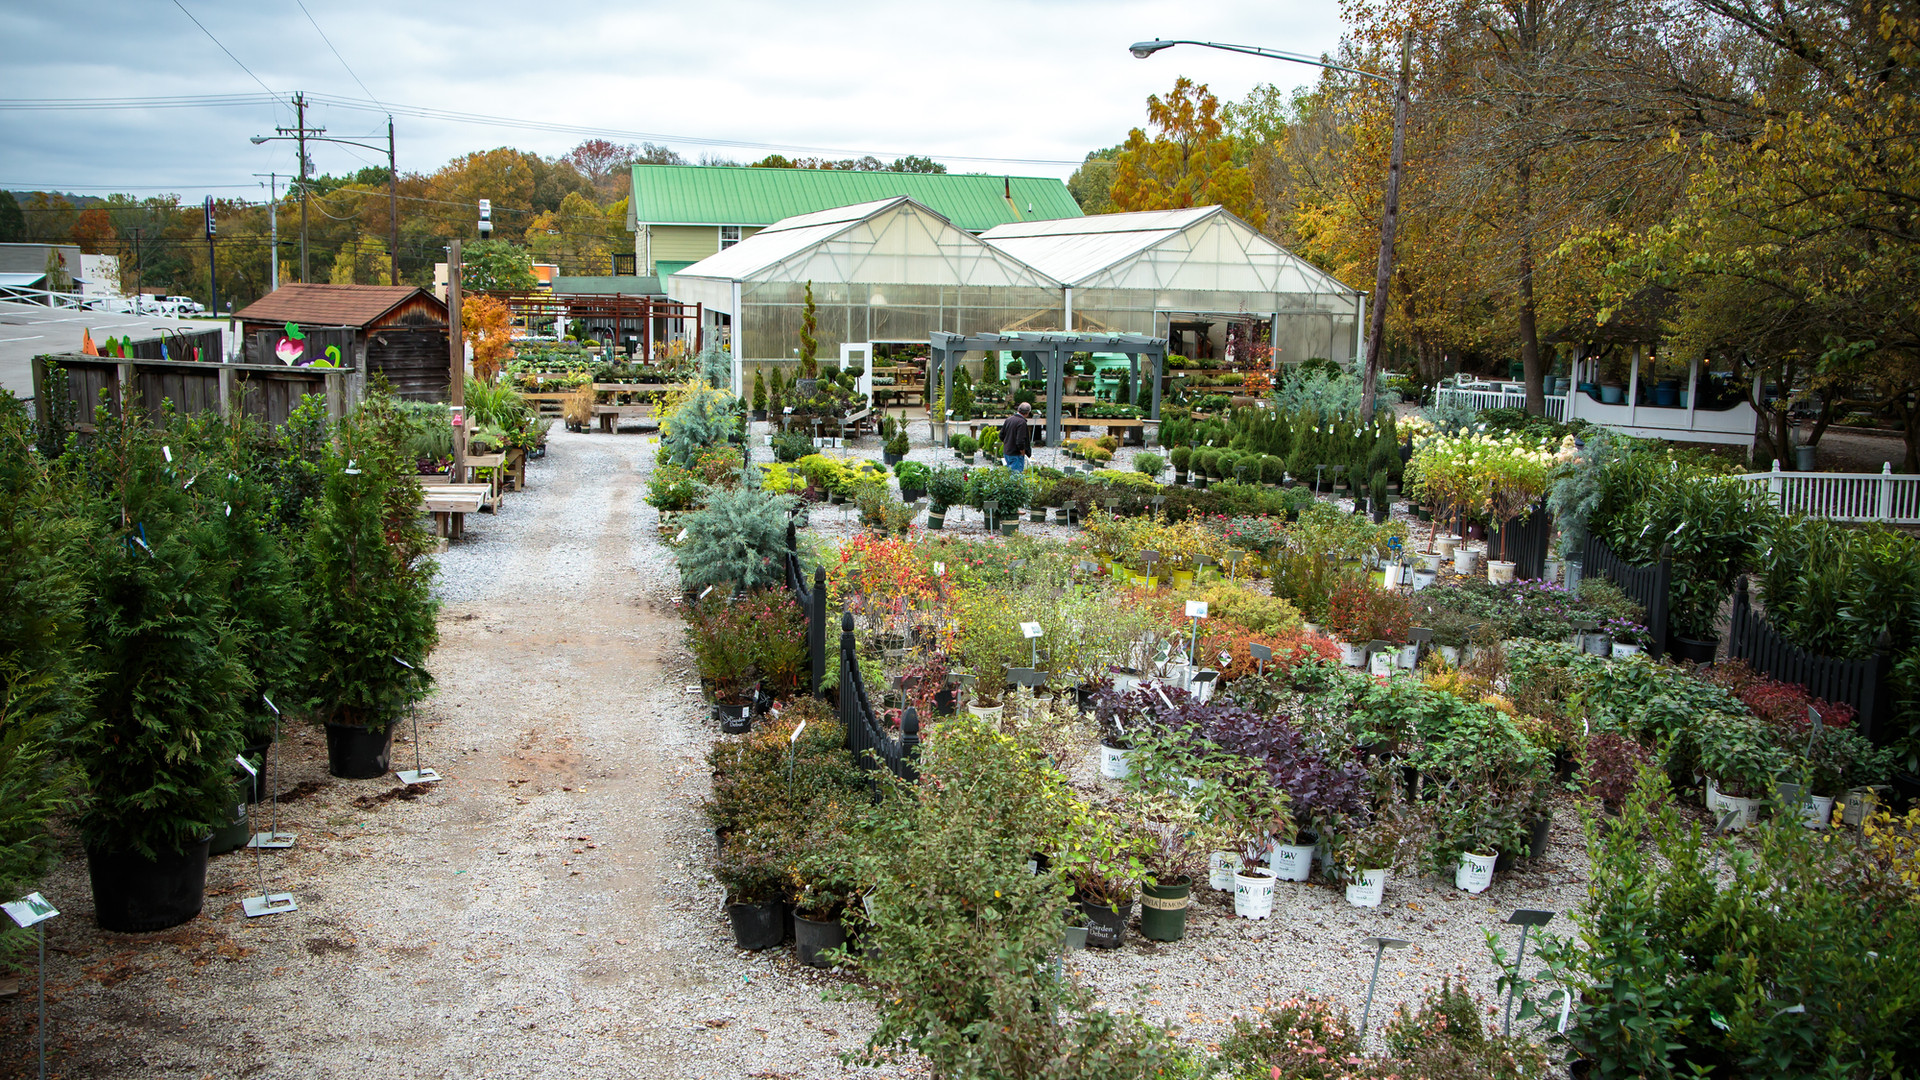 Moore & Moore Garden Center